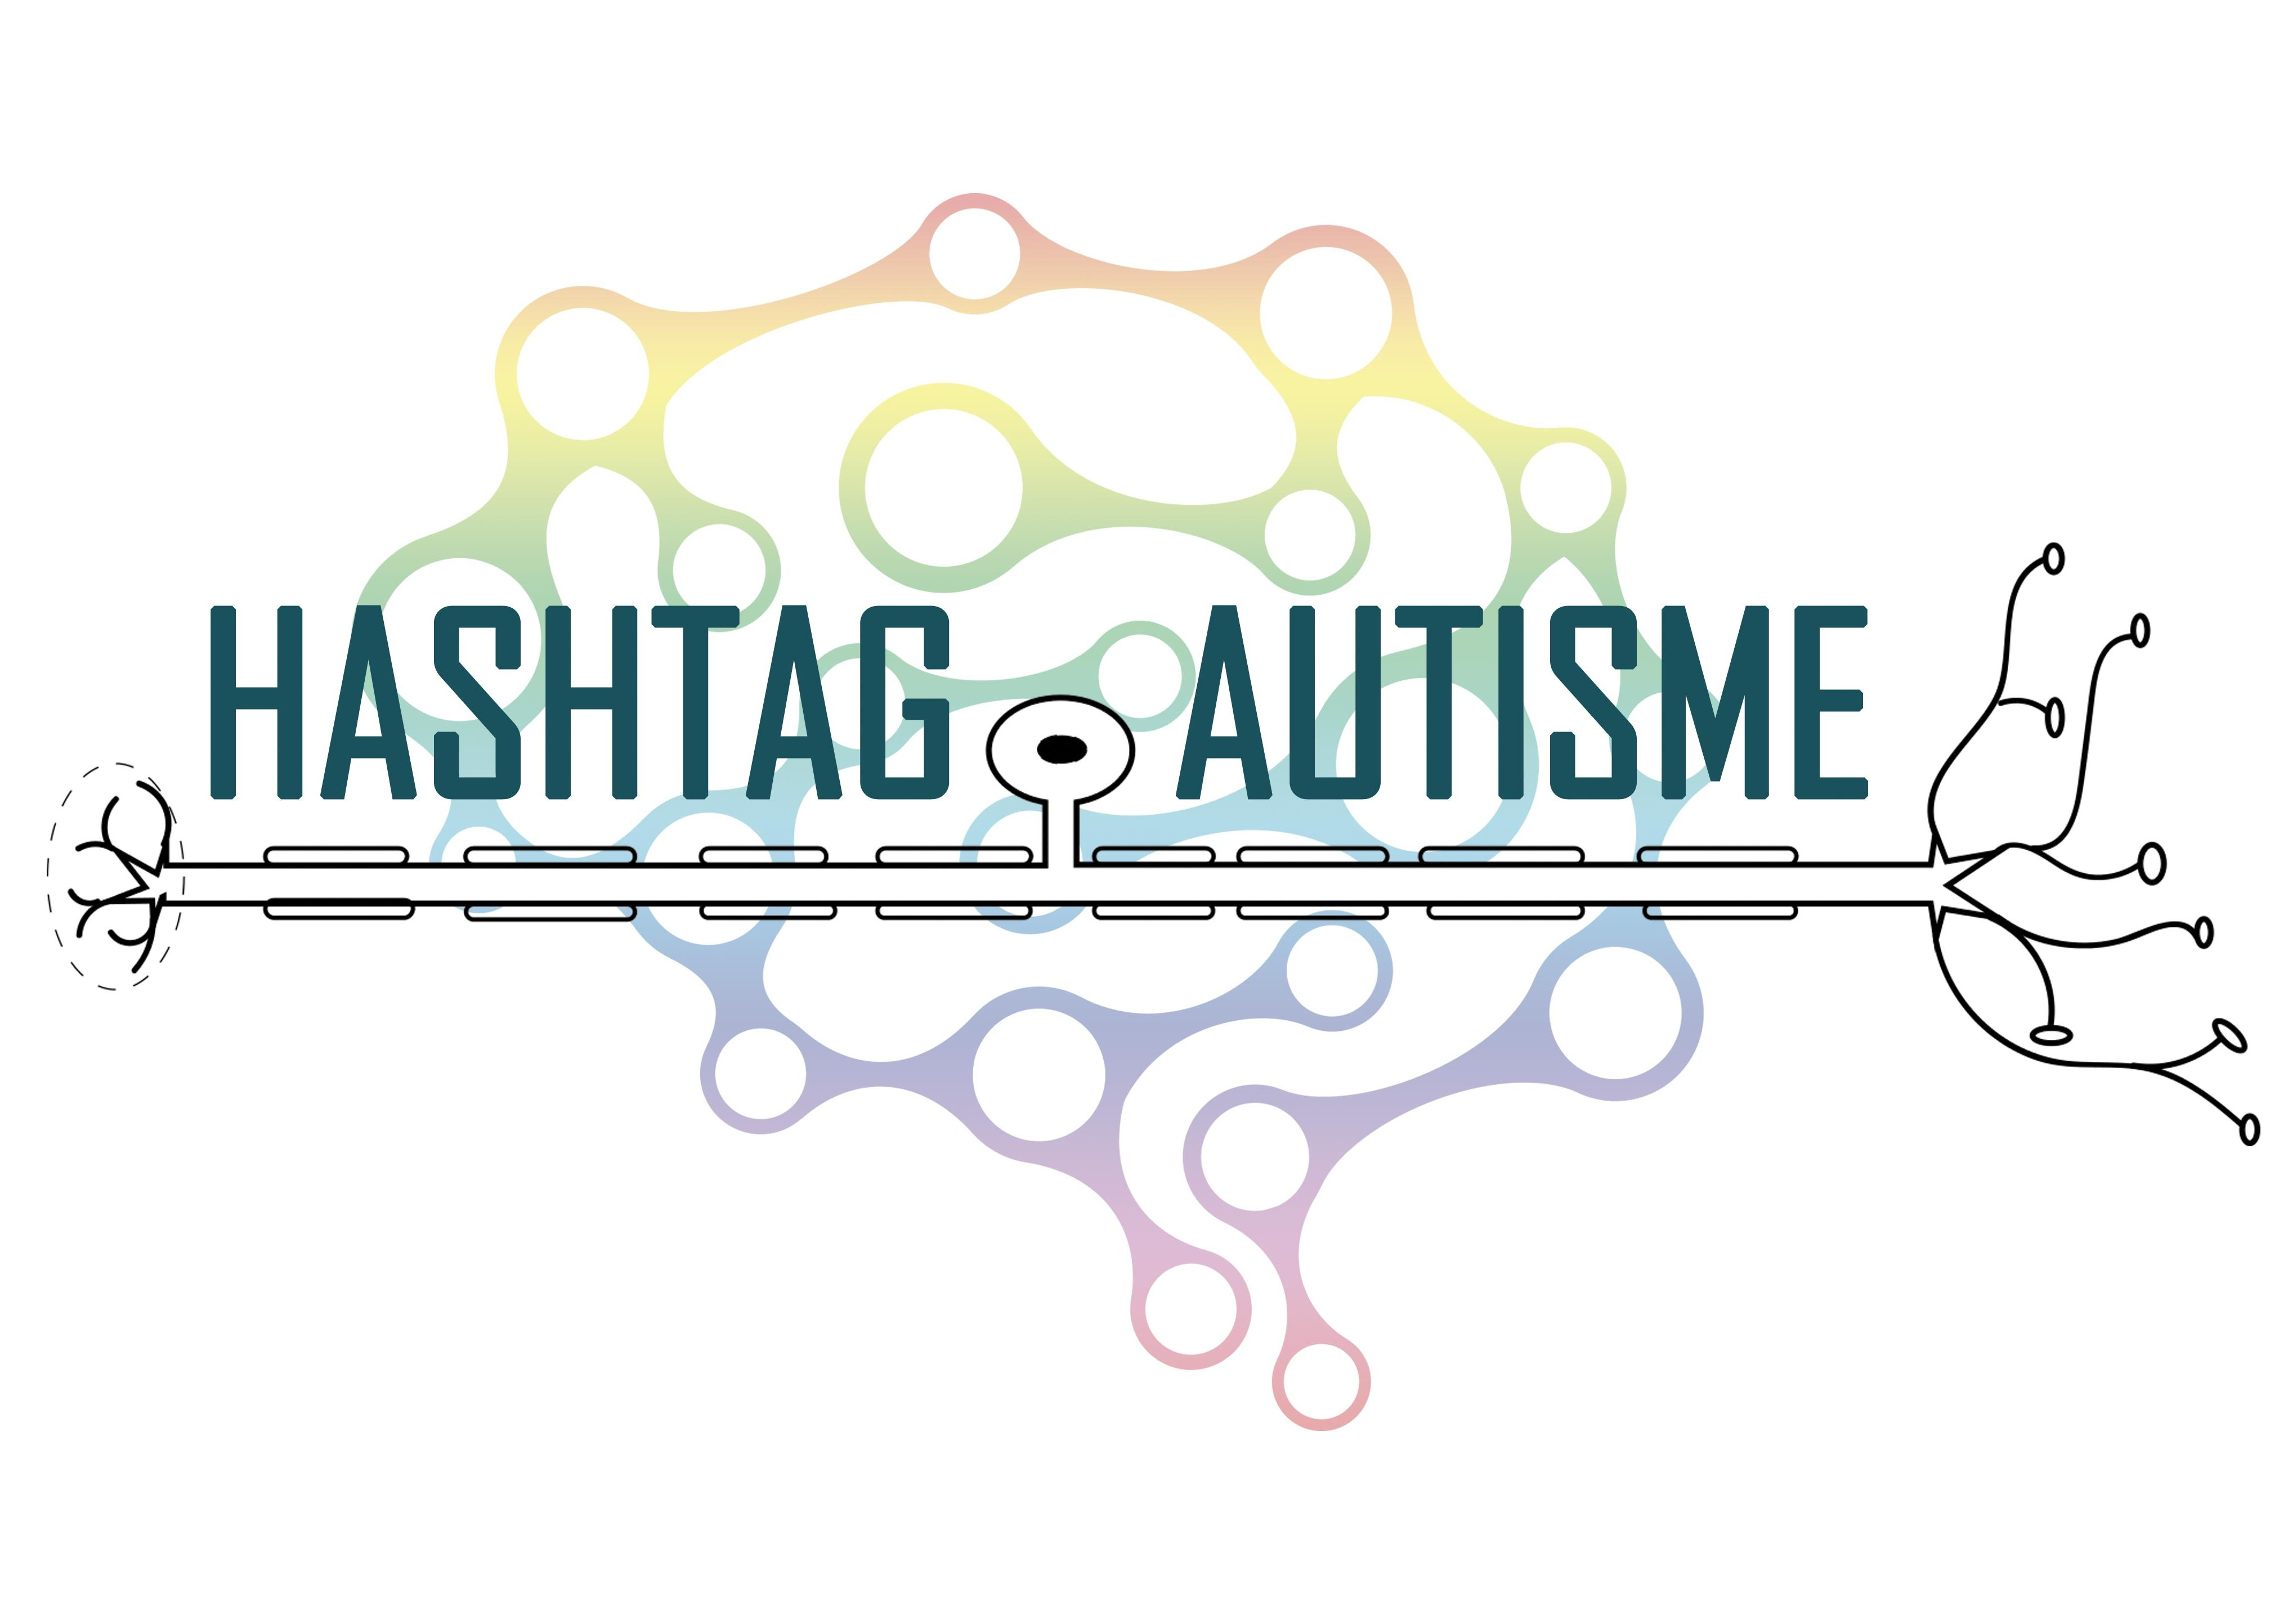 #AutismeFrance